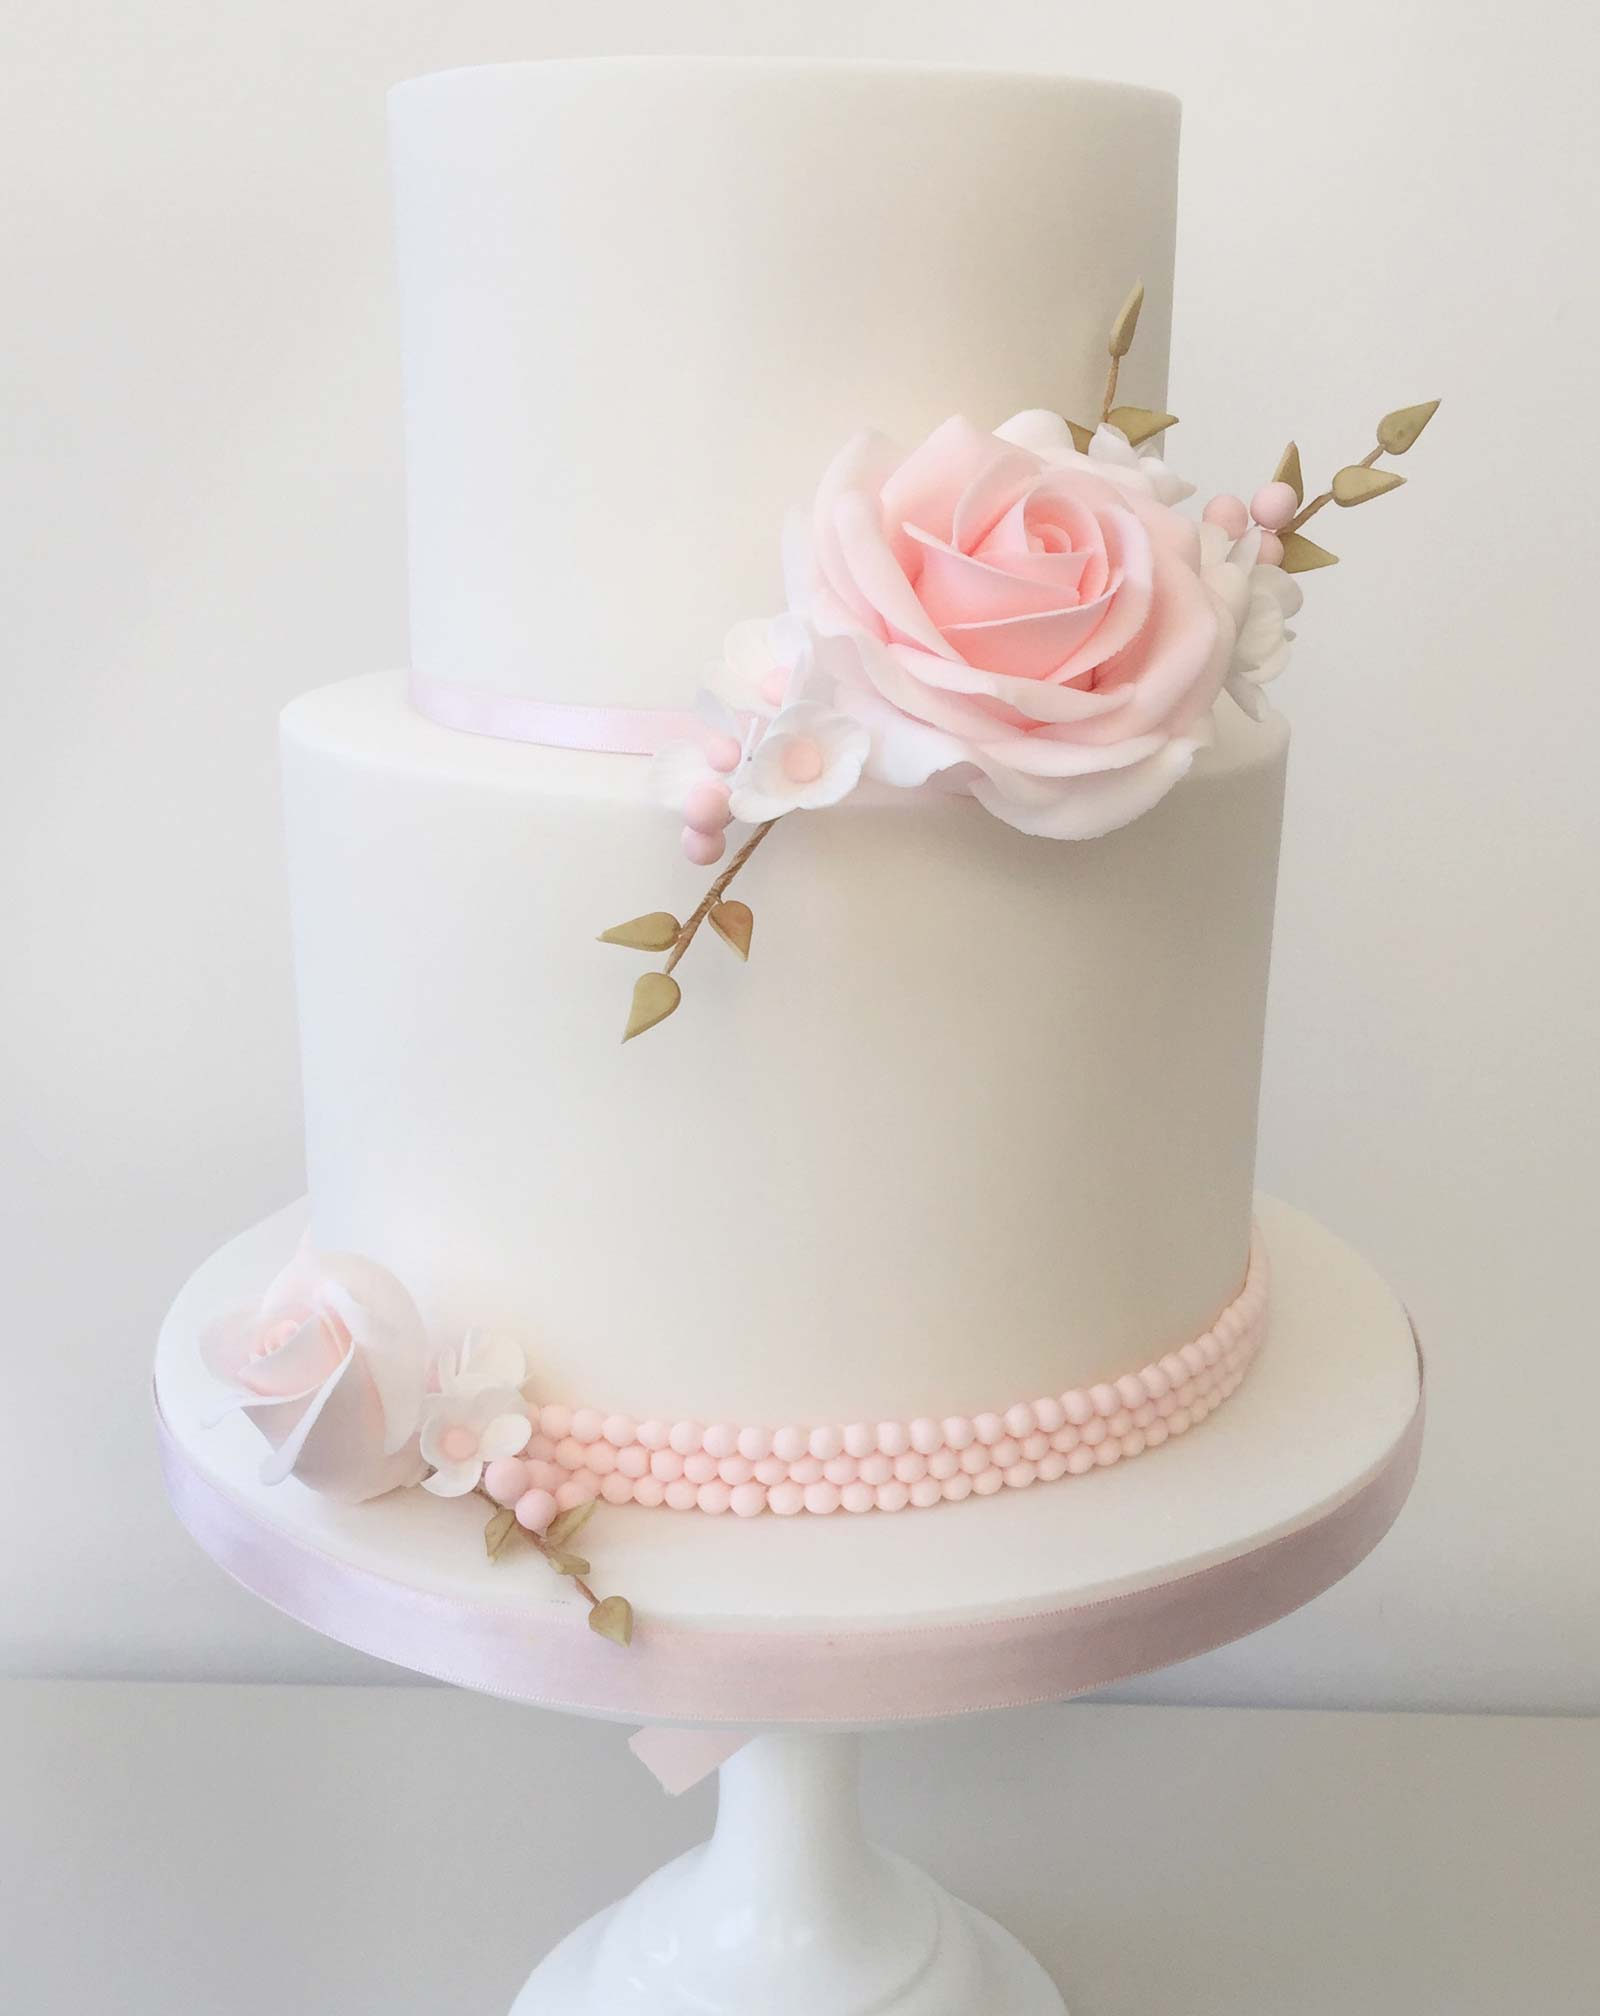 Wedding Cake Flowers.Cake Decorating Classes Cake Covering Sugar Flowers Pearls